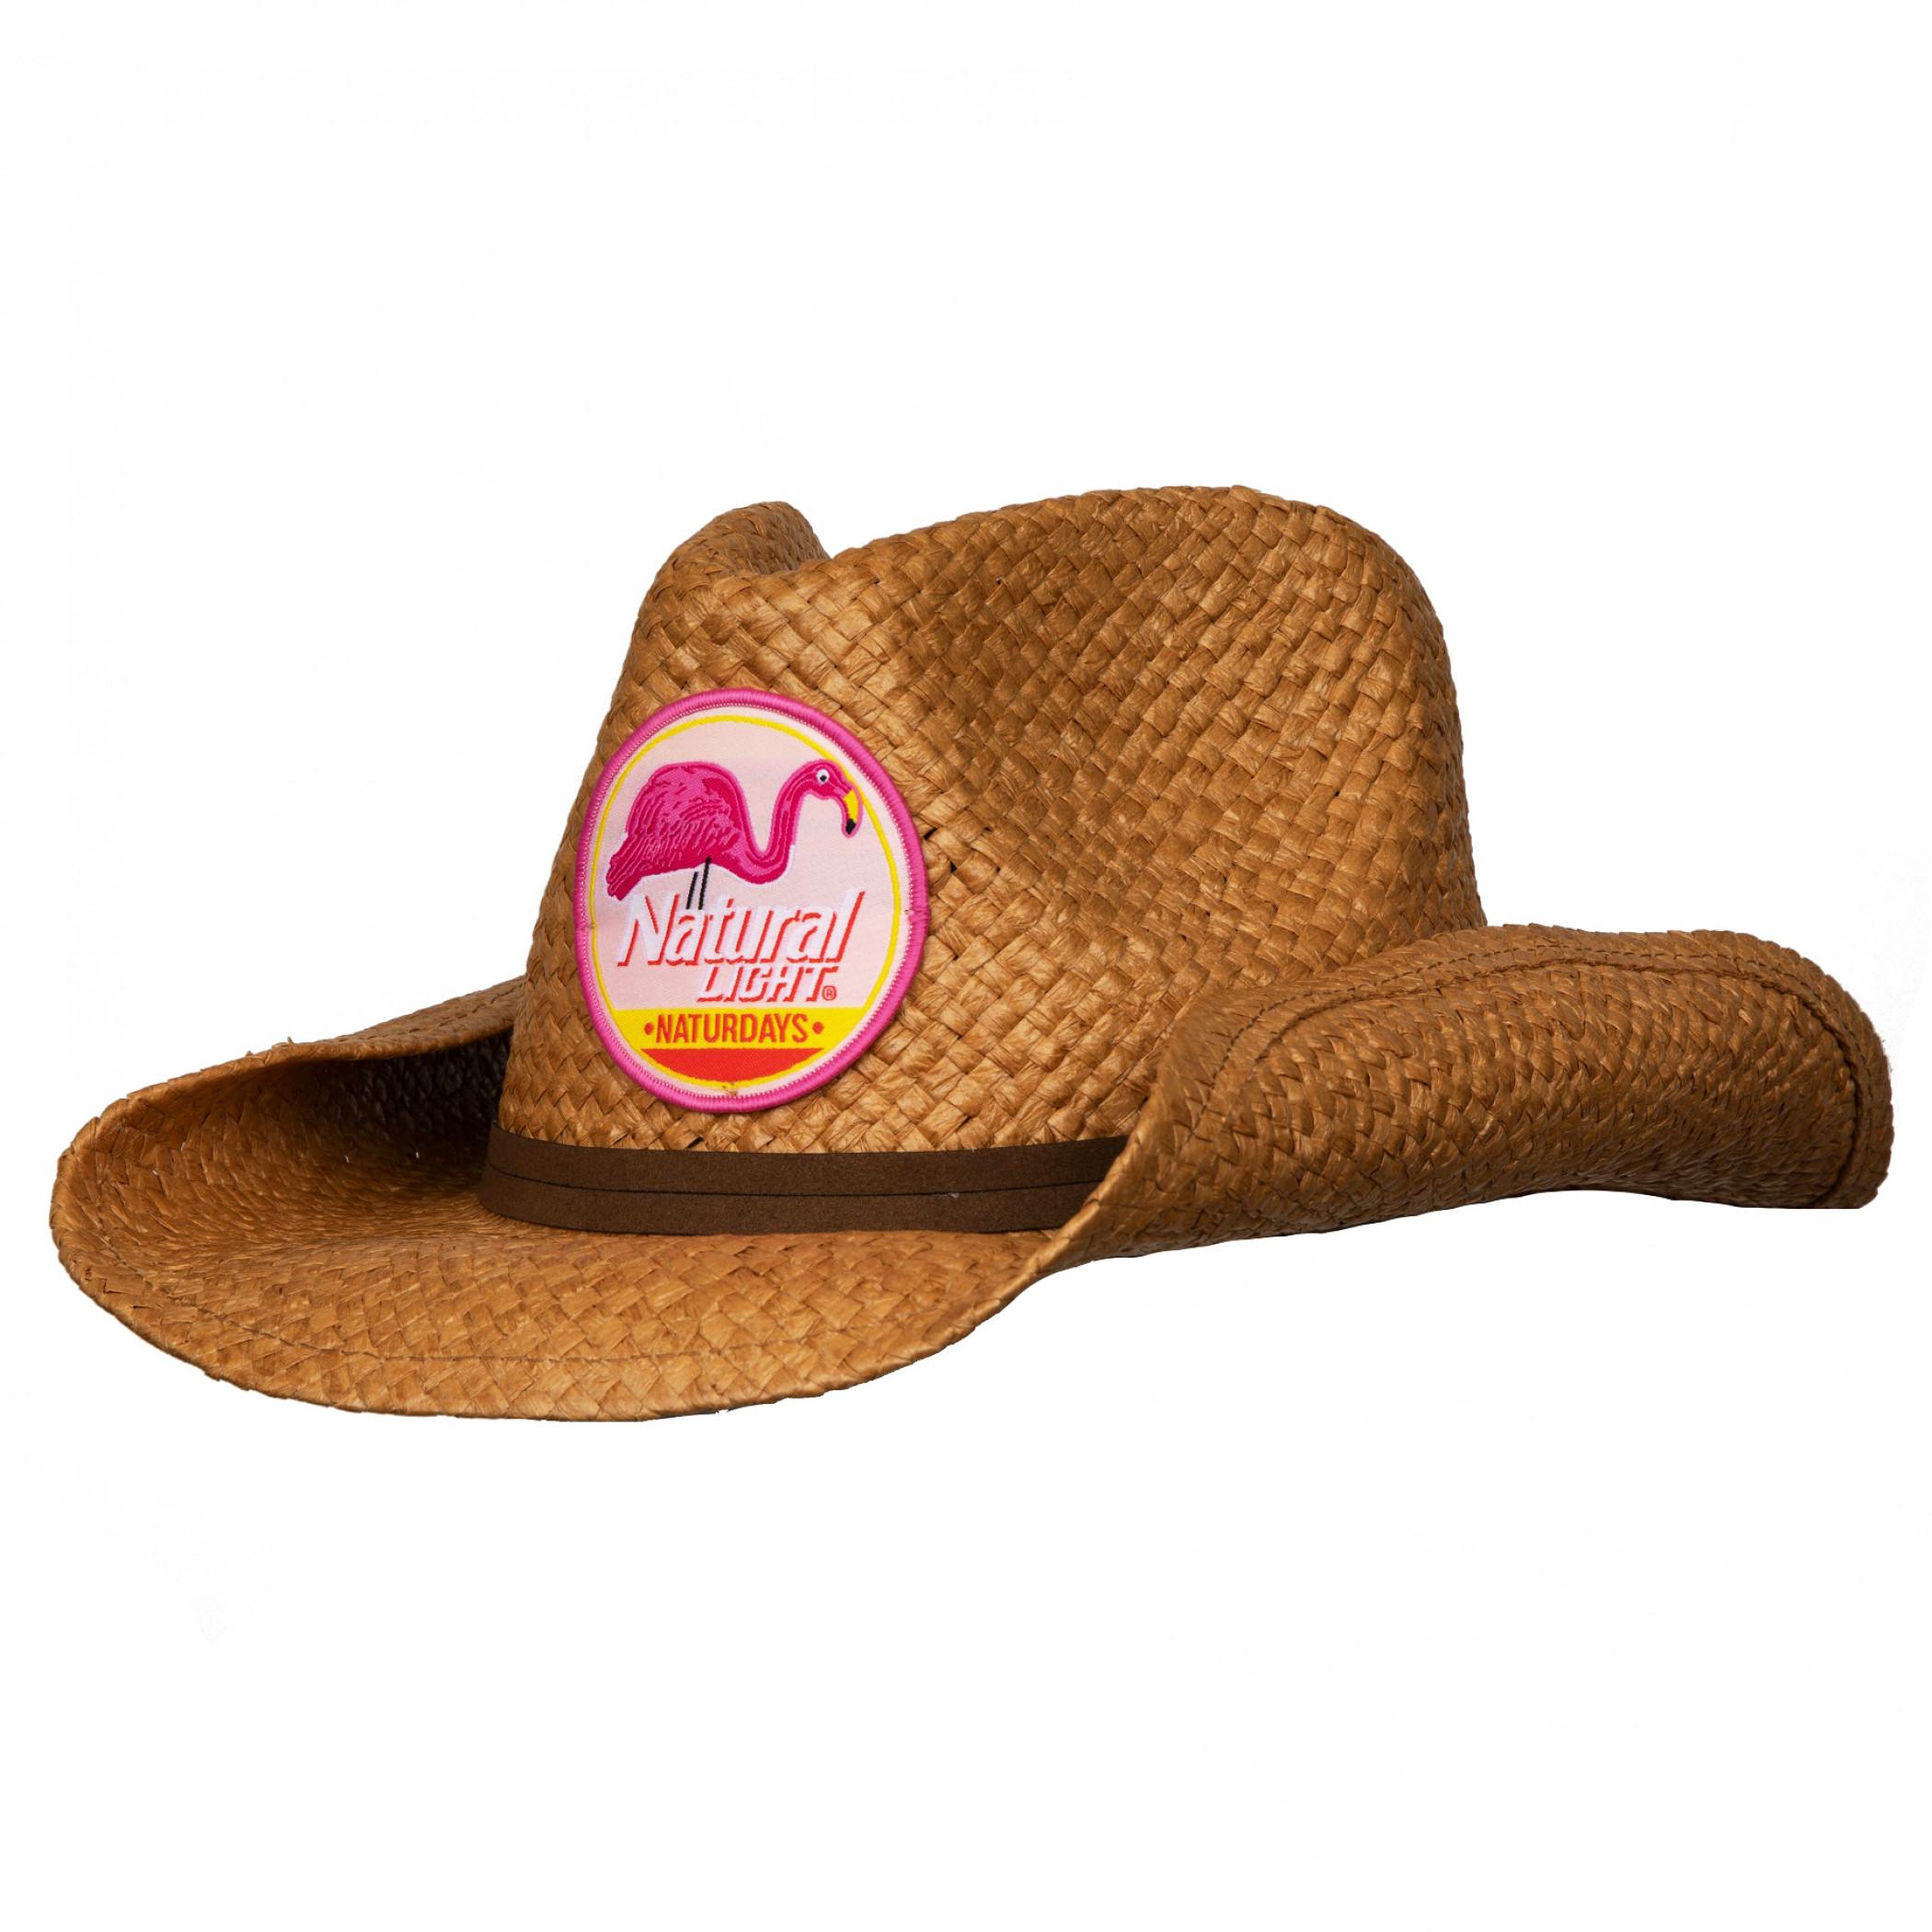 Natural Light Naturdays Straw Cowboy Hat With Brown Band